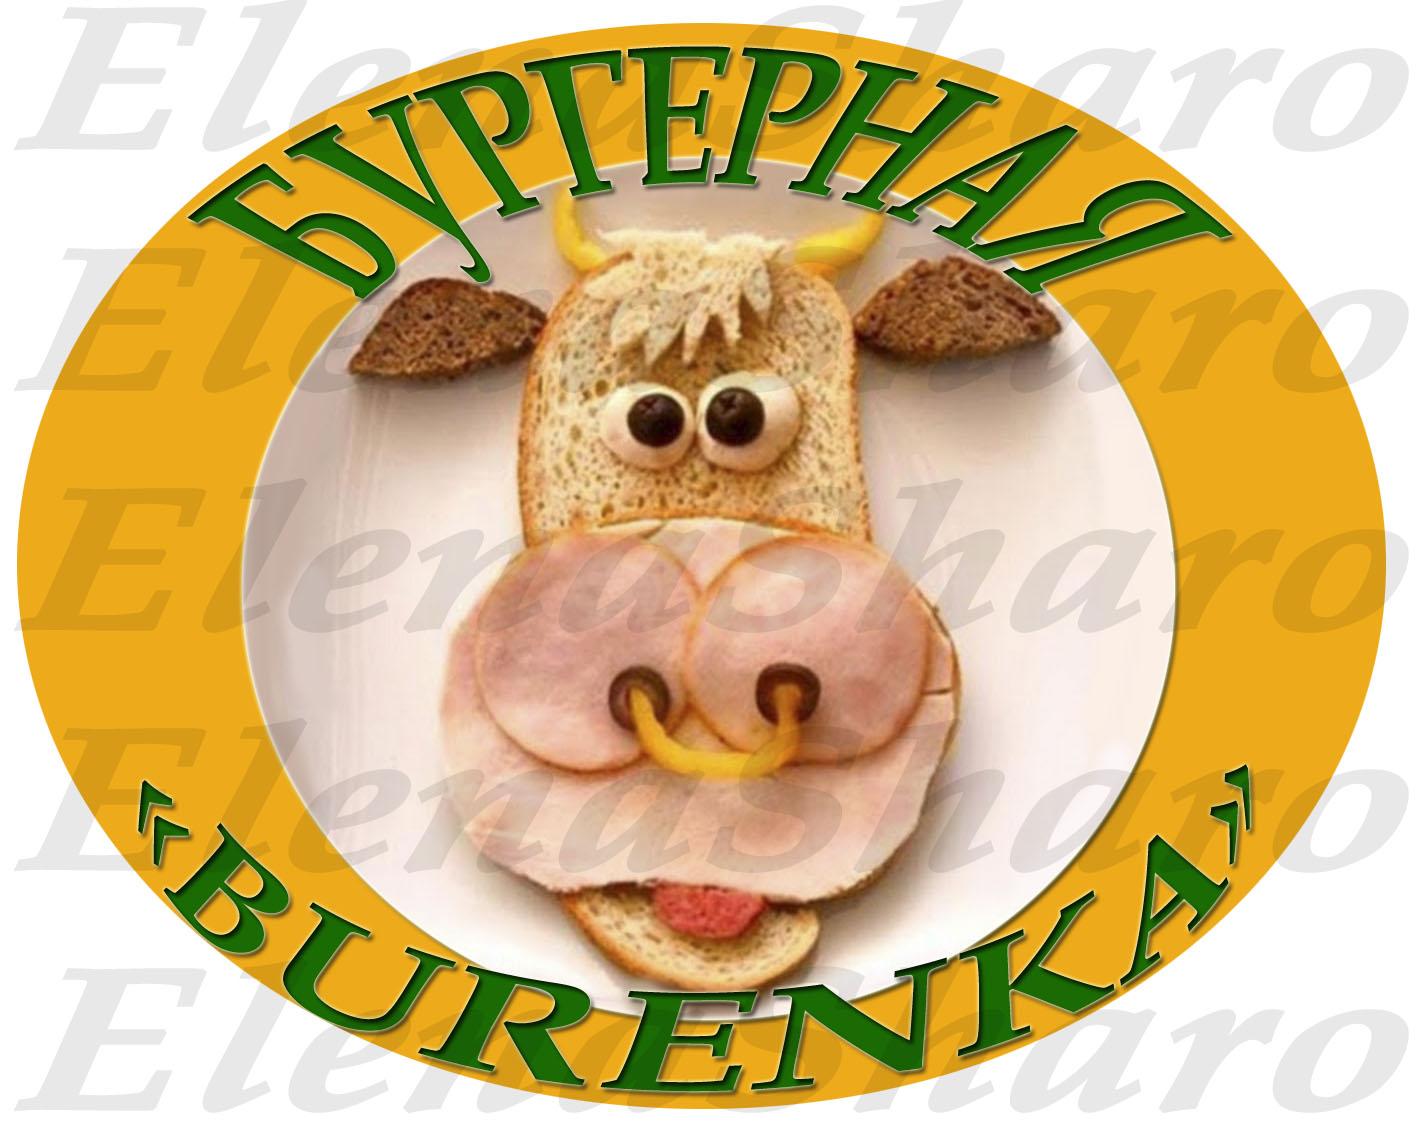 Логотип для Бургерной с Пекарней фото f_7755e1a141767718.jpg